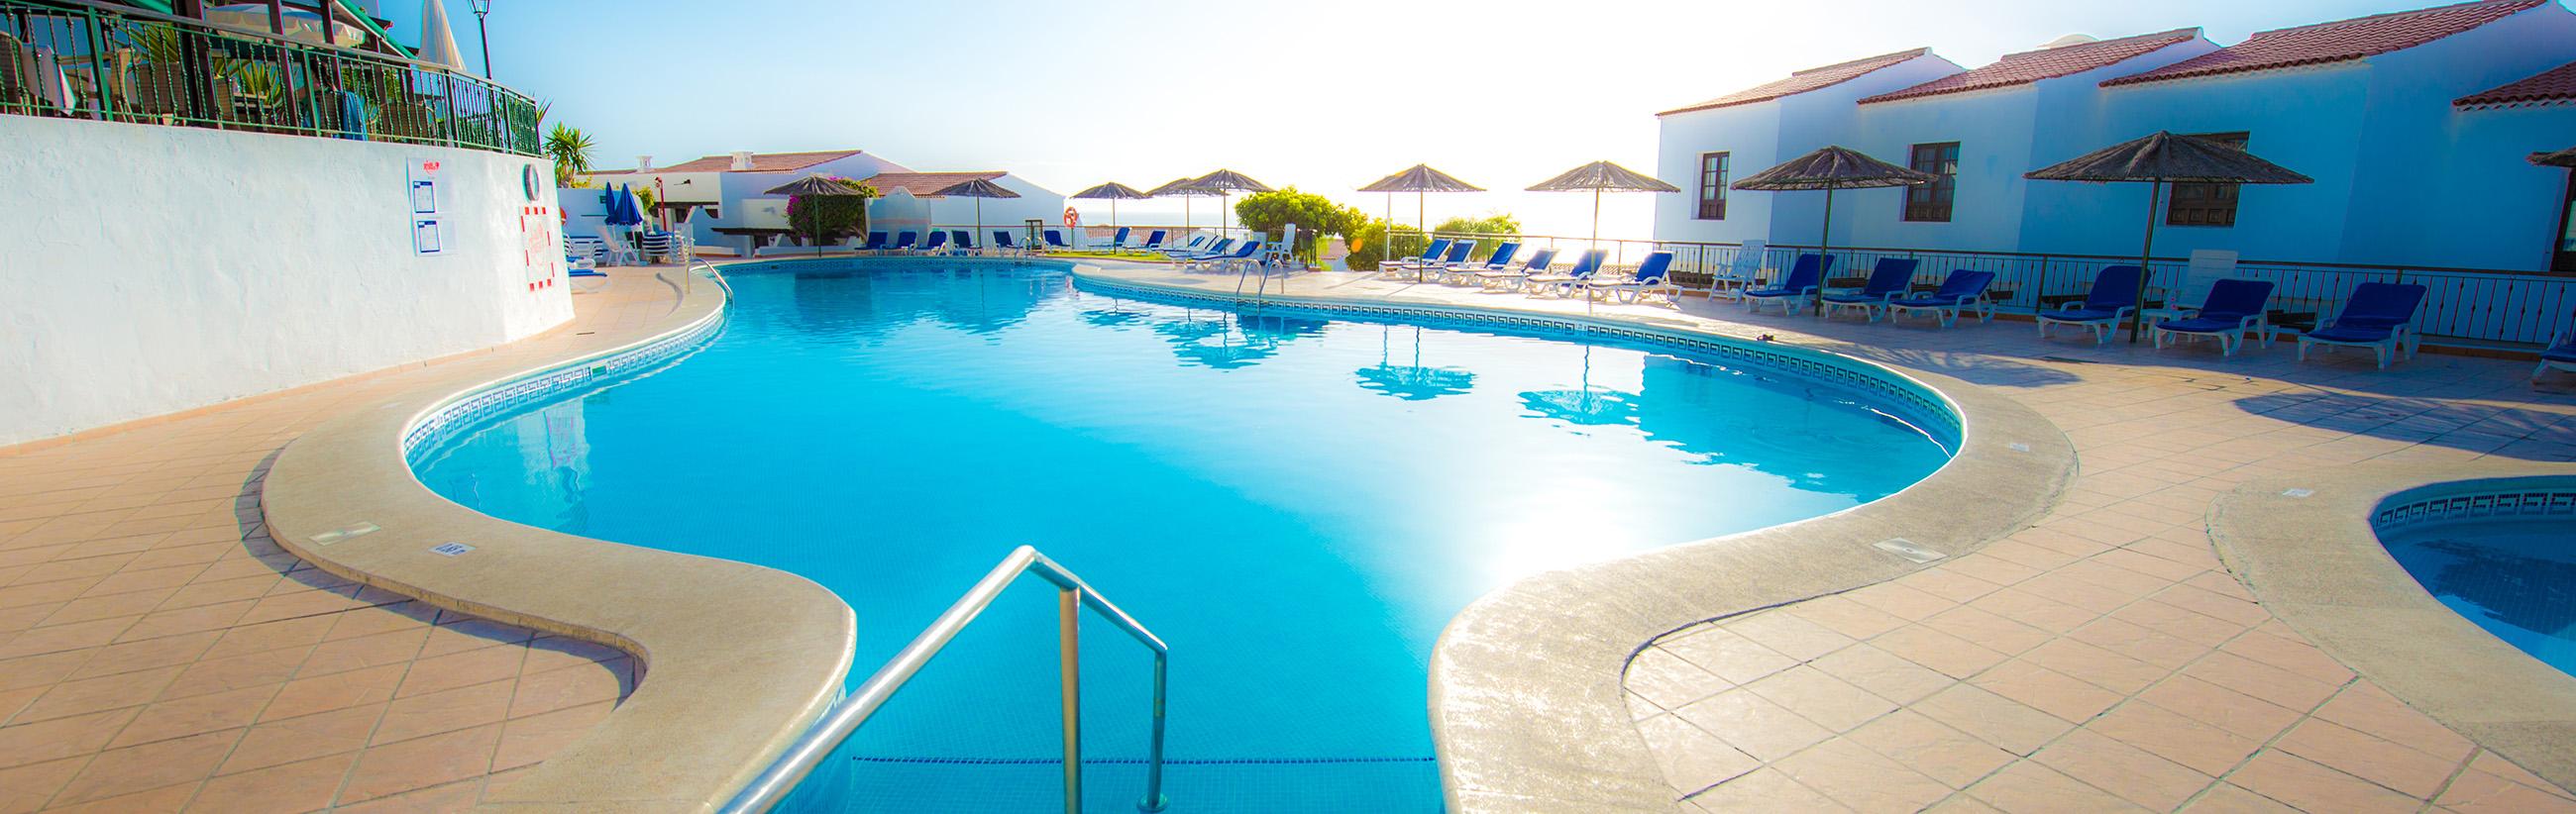 Las Rosas WimPen Swimming Pool 2